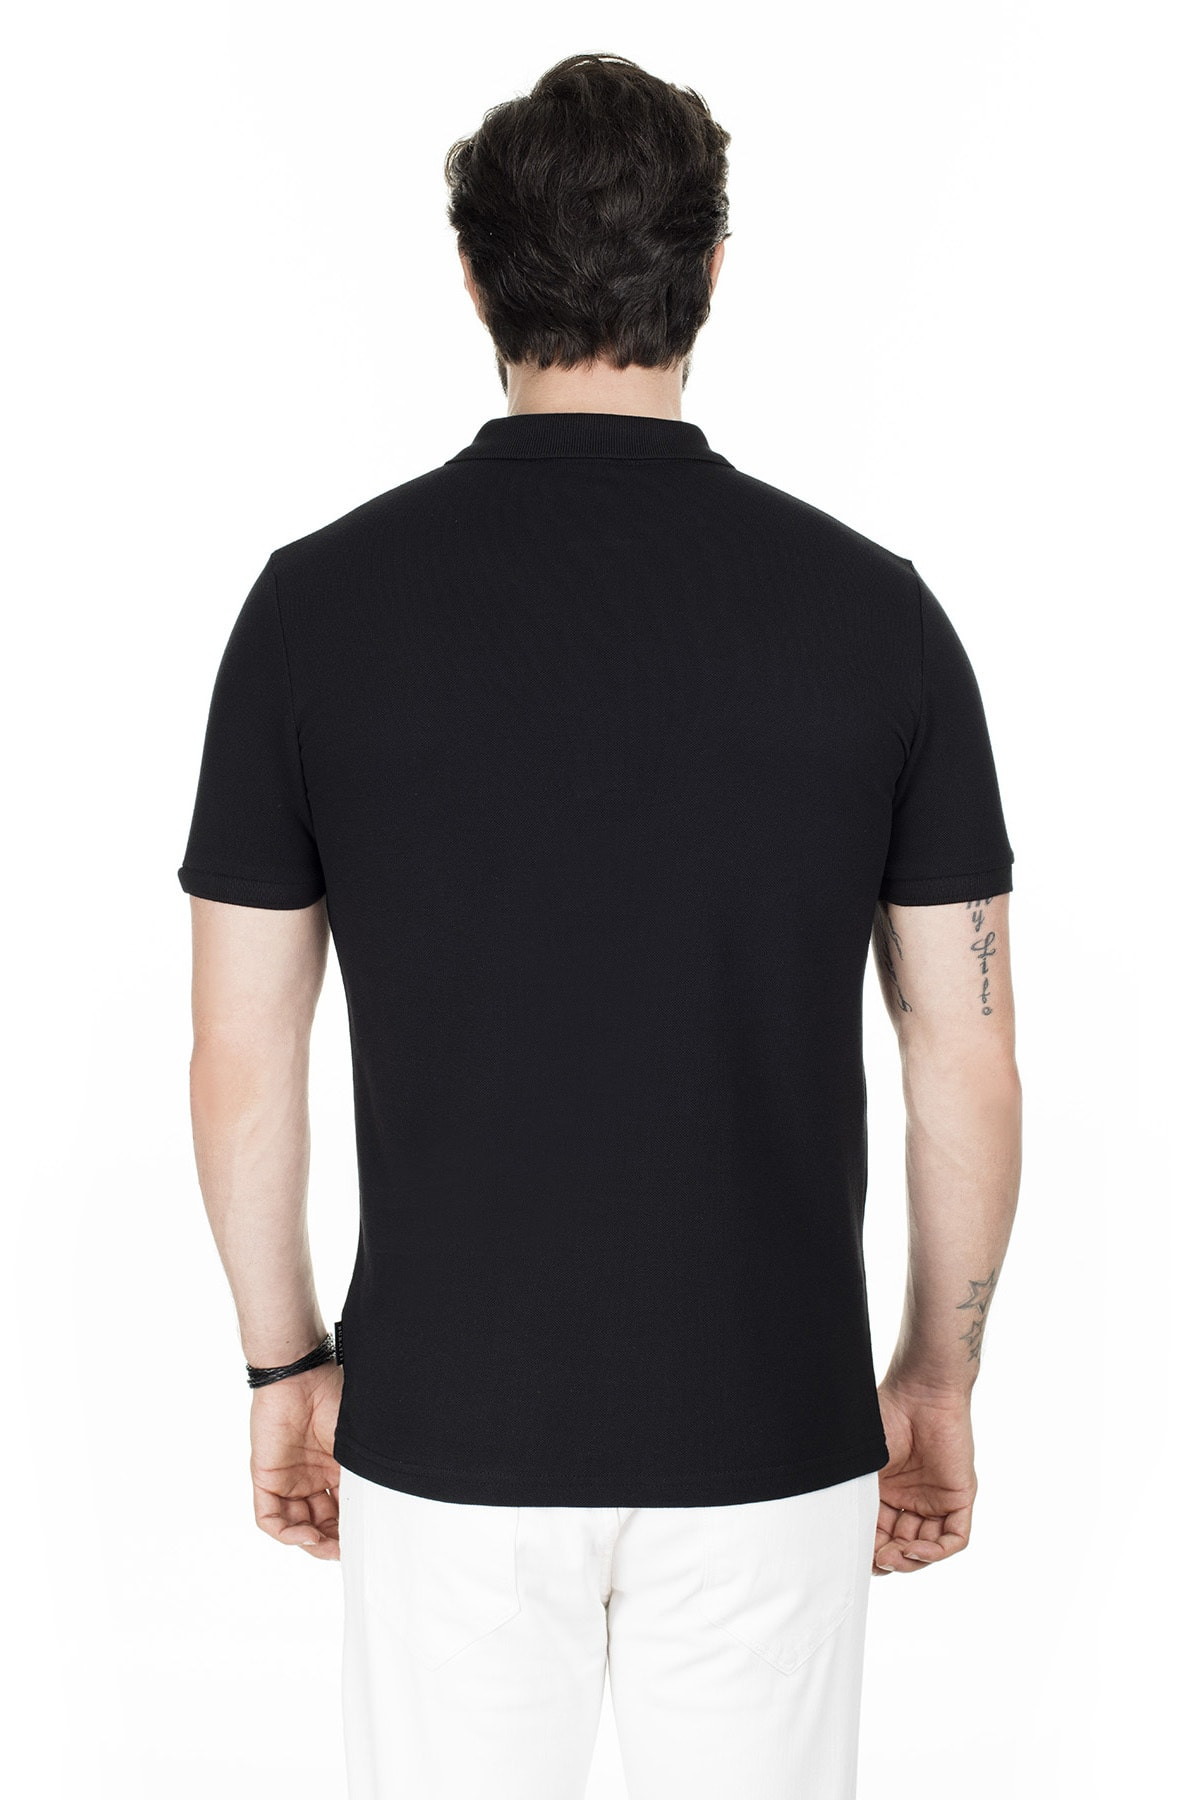 Buratti Erkek Siyah Düğmeli Polo Yaka Pamuklu Günlük T Shirt 4362050 1